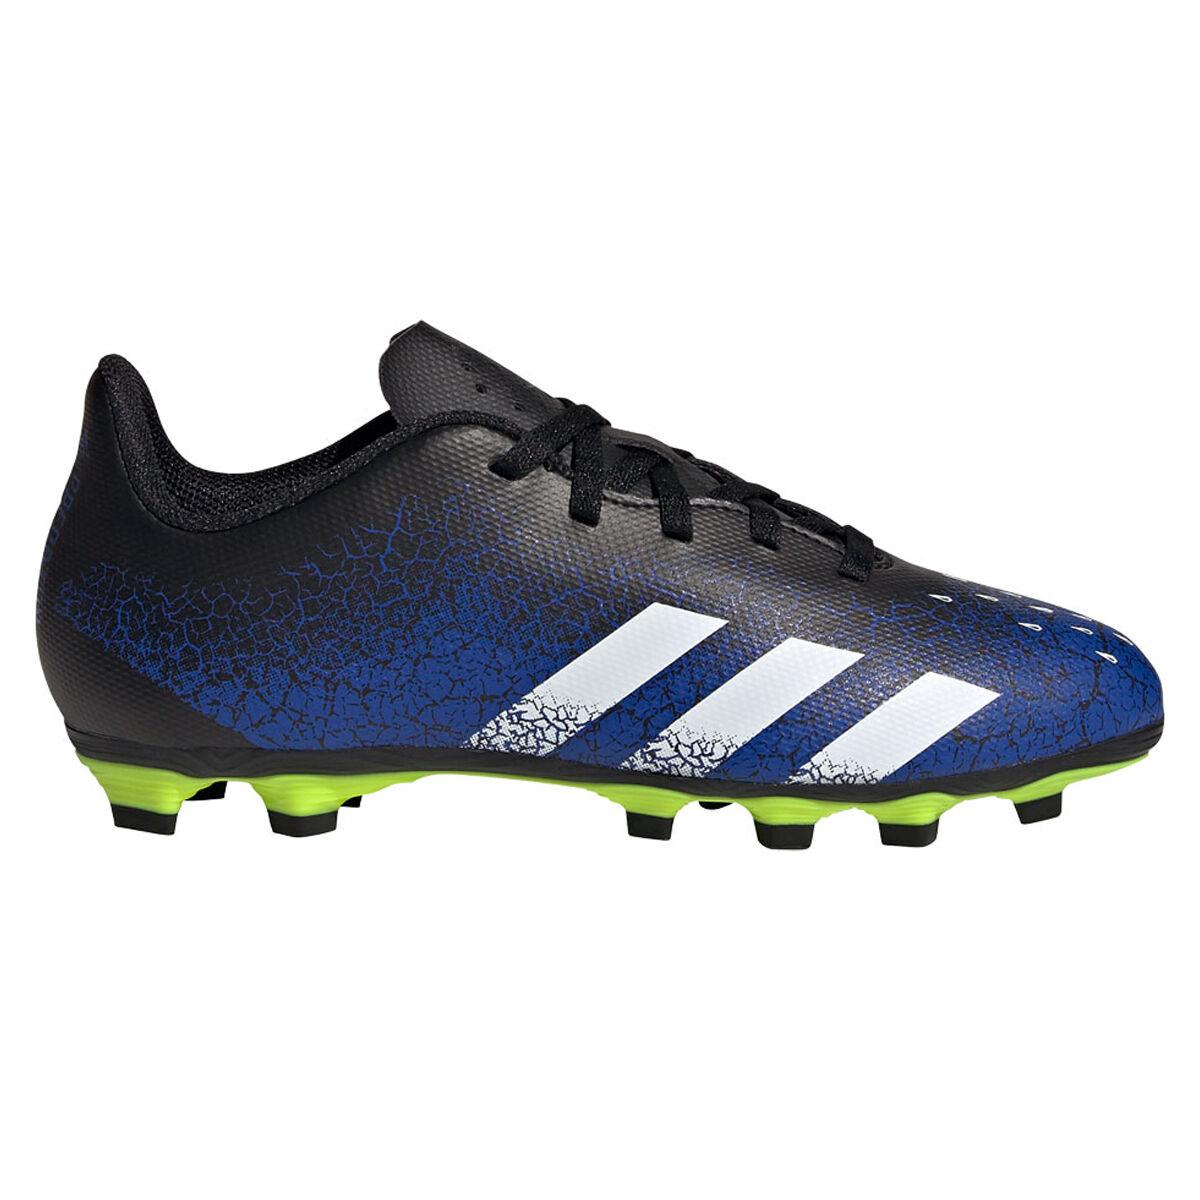 pelota adidas 2018 shoes black women sandals white | adidas Predator Freak .4 Kids Football Boots